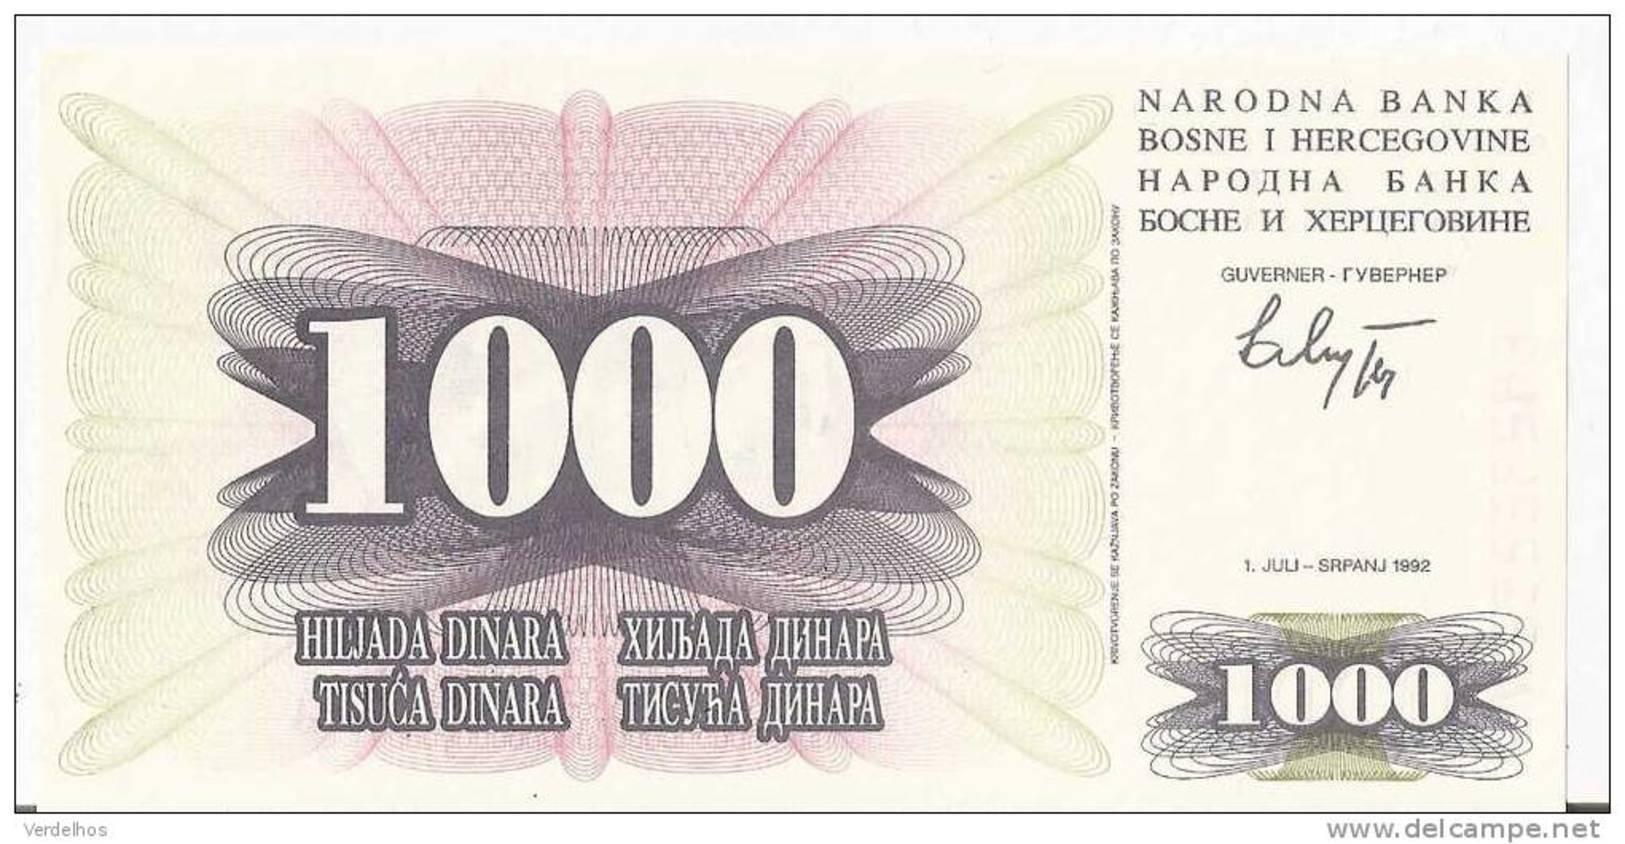 BOSNIE-HERZEGOVINE 1000 DINARA 1992 UNC P 15 - Bosnia Erzegovina